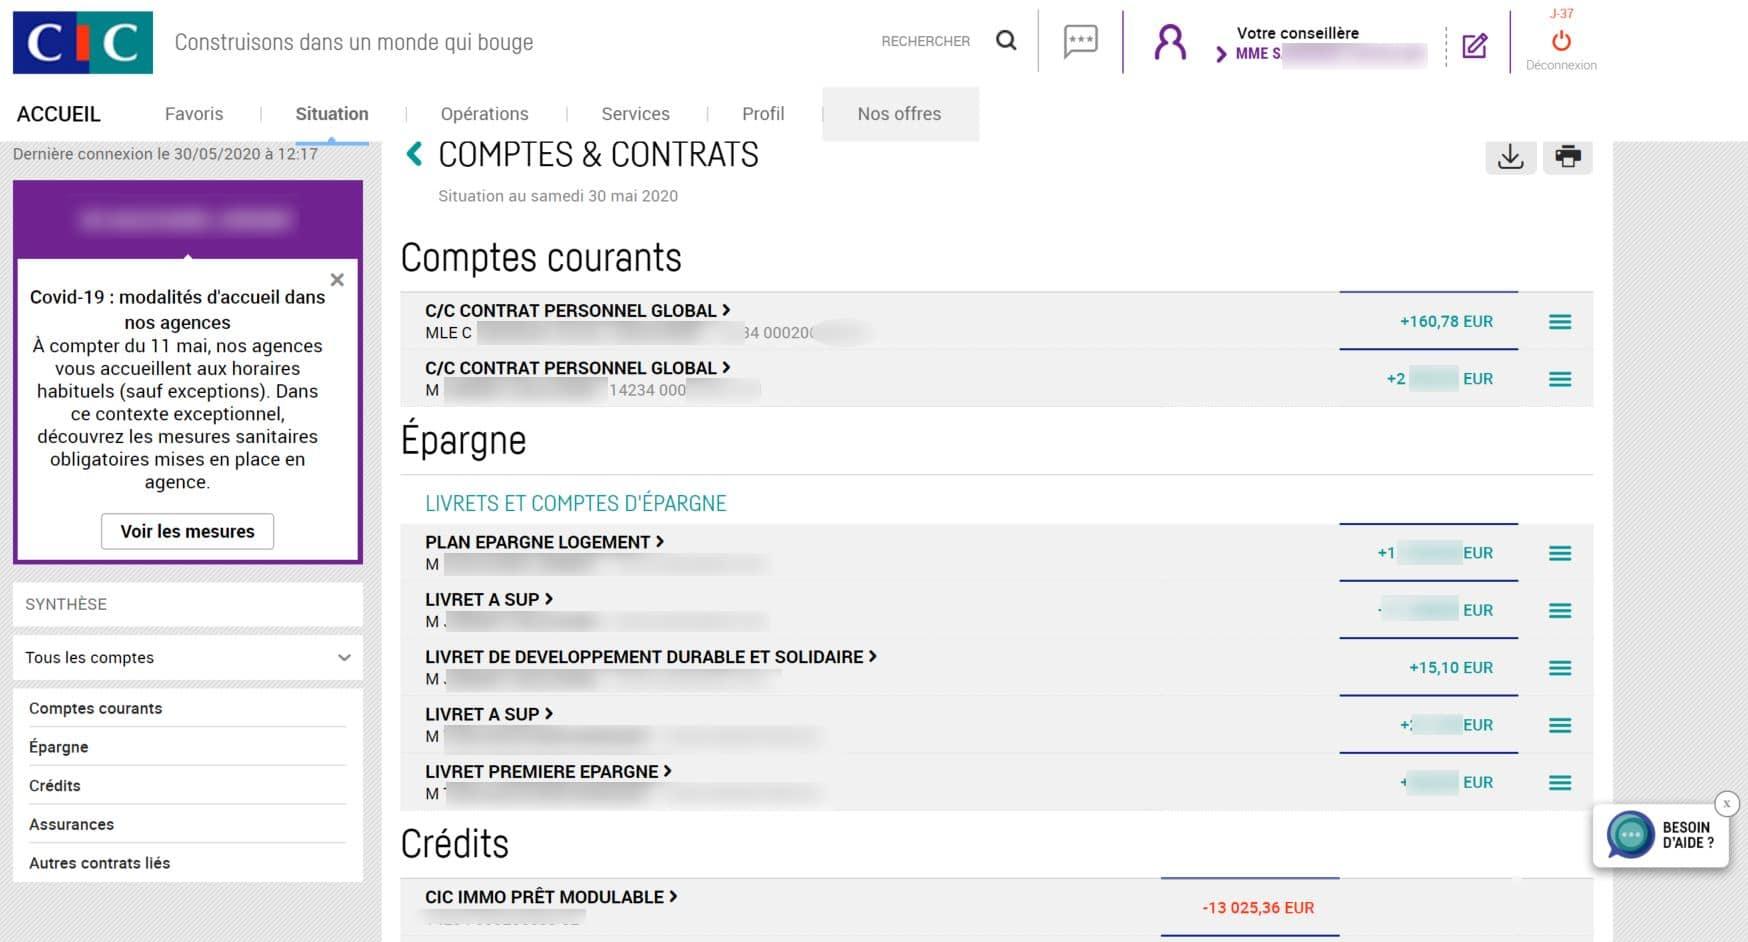 consultation comptes en banque cic filbanque